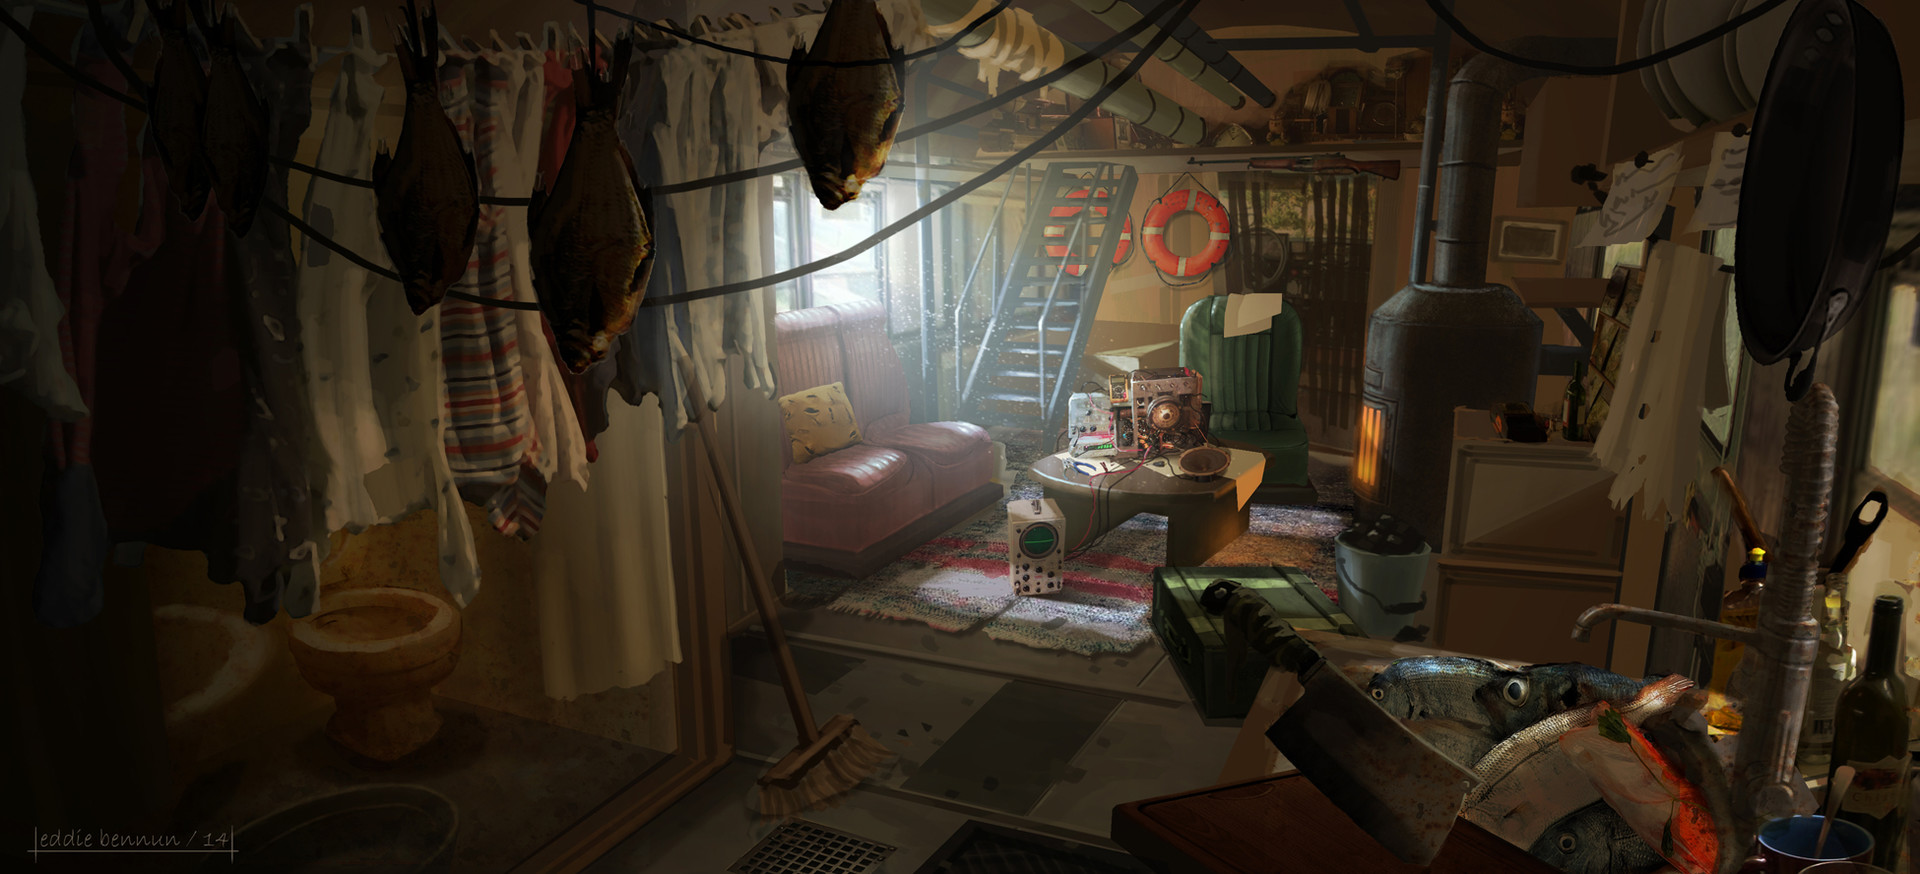 Eddie bennun living room lr